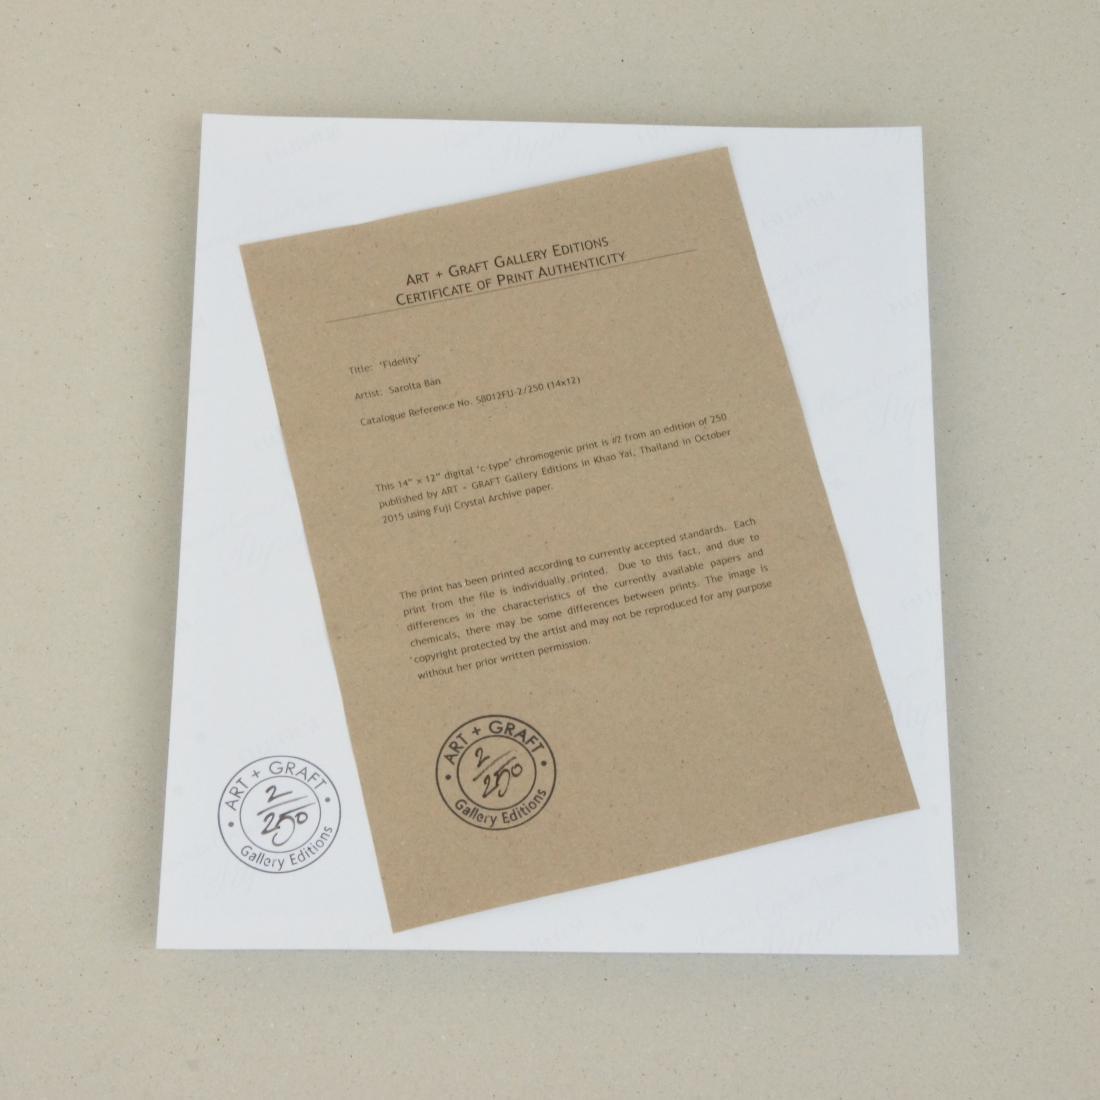 Sarolta Ban - Print - Fidelity - 3